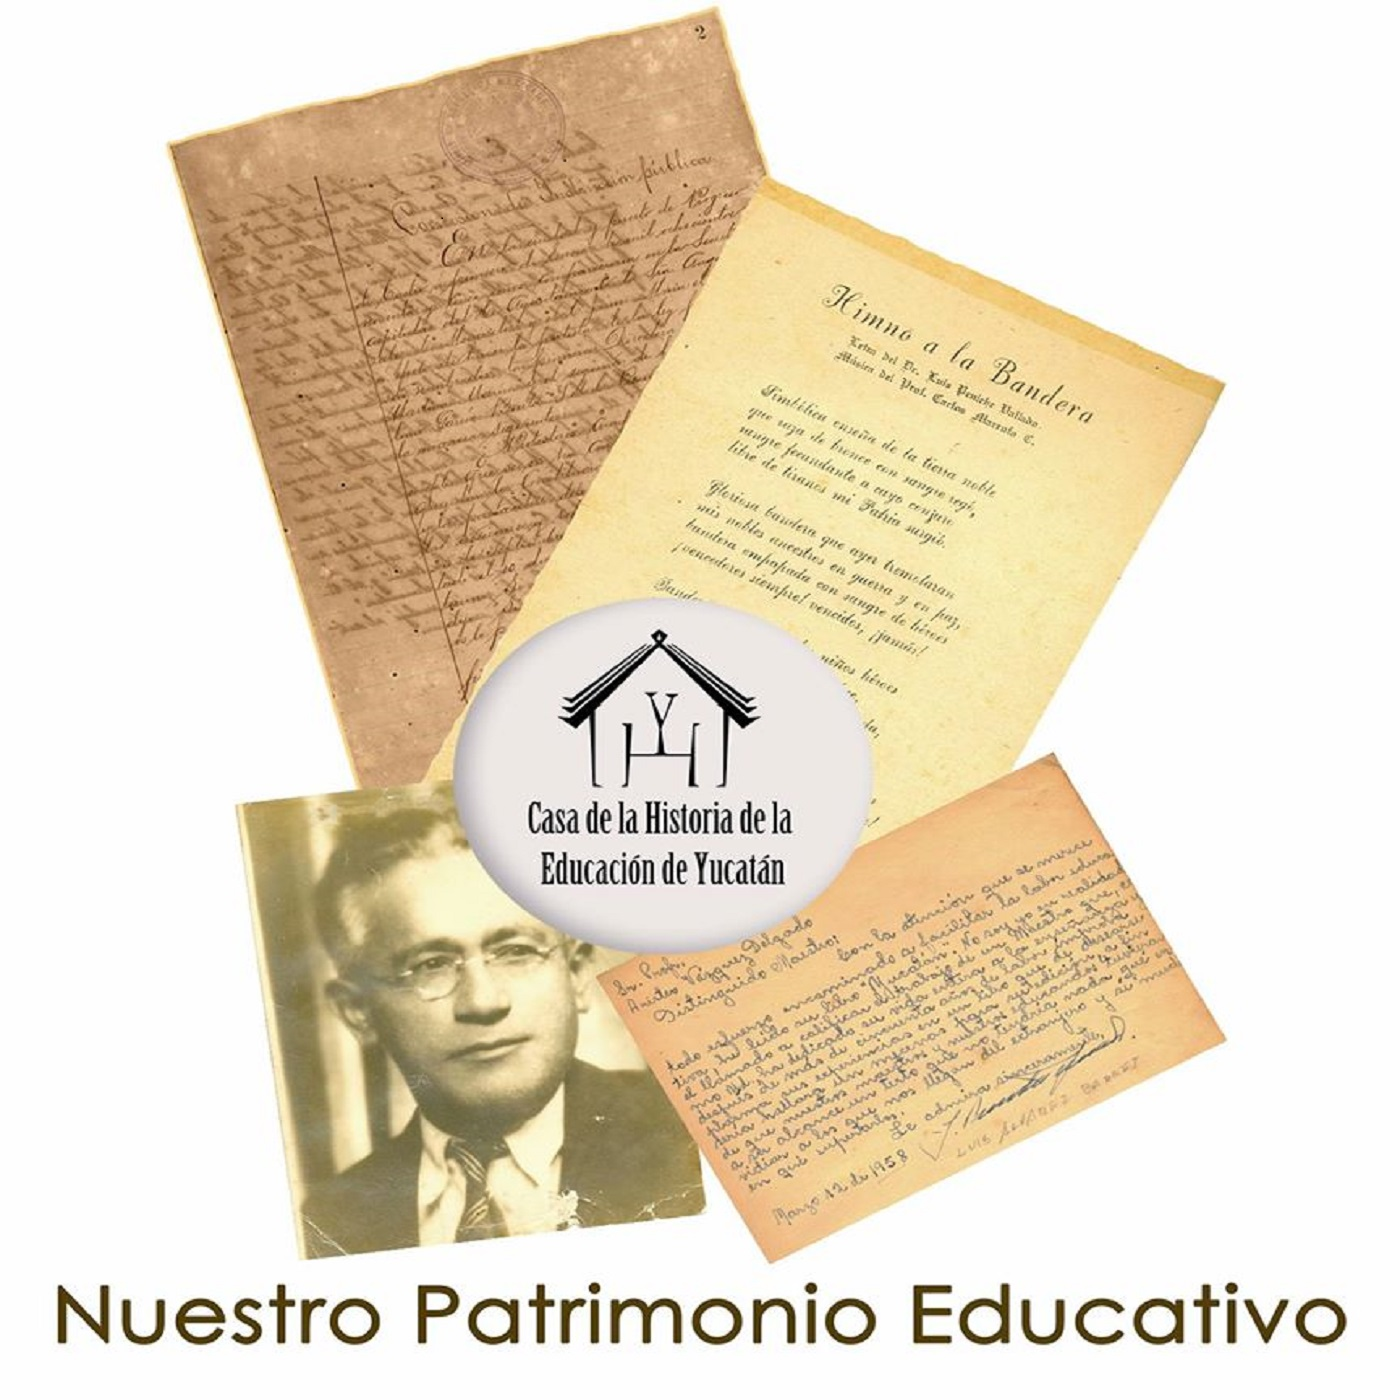 Nuestro Patrimonio Educativo